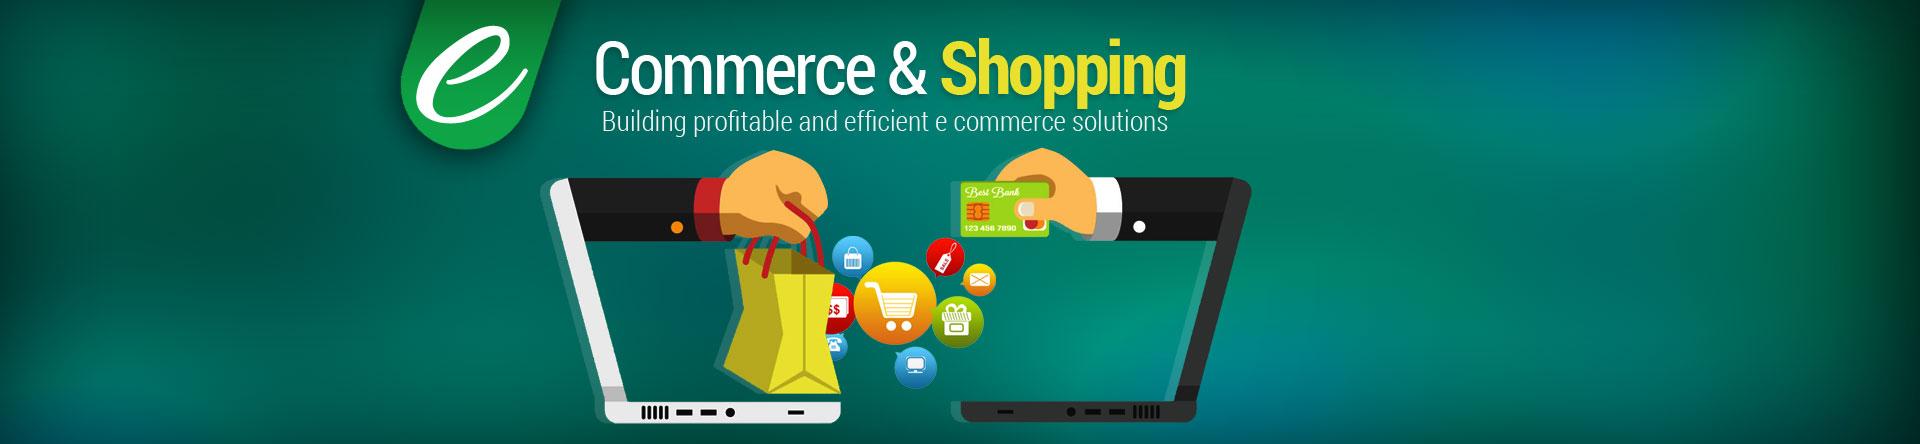 Banner design for e commerce - Ecommerce Shopping Web Solutions